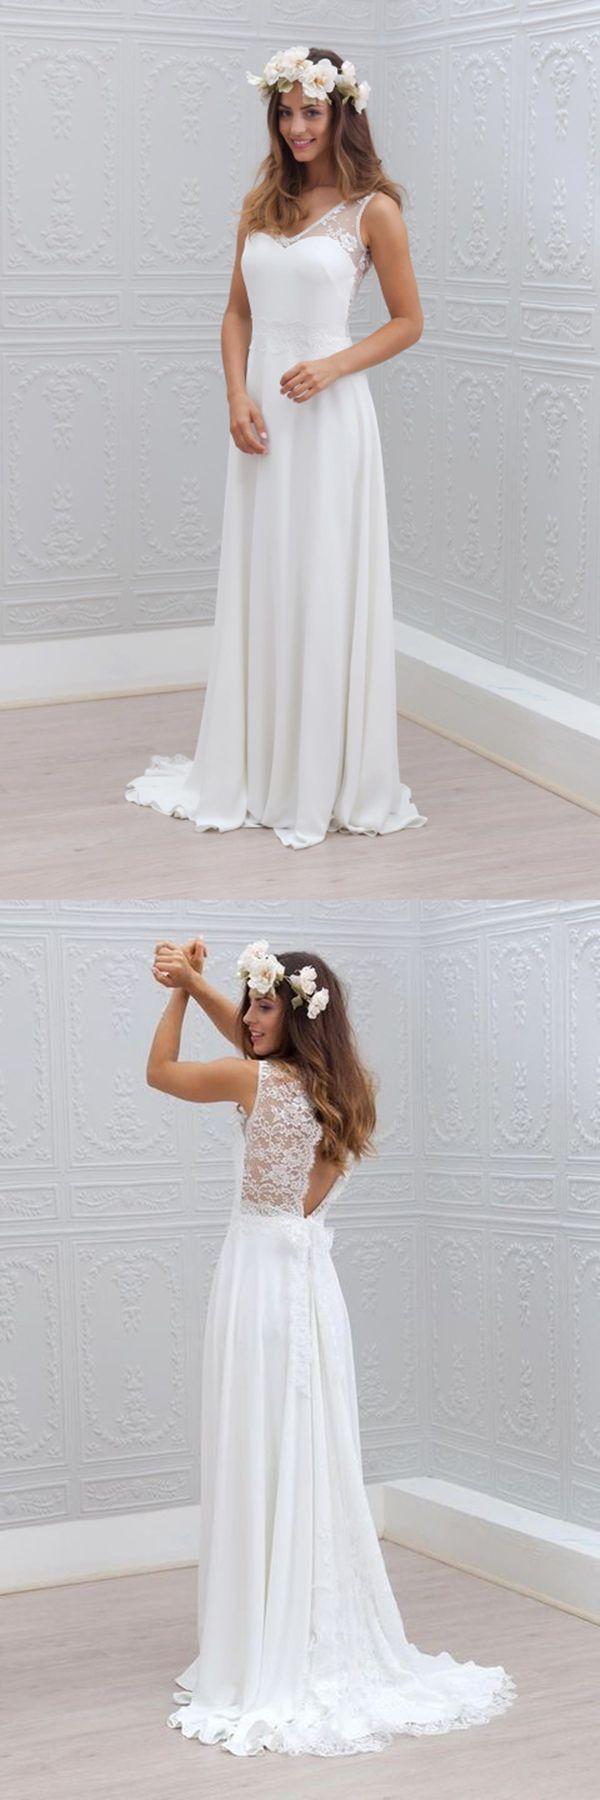 Wedding dresses beach  simple white wedding dressesbeach wedding dressopen back long